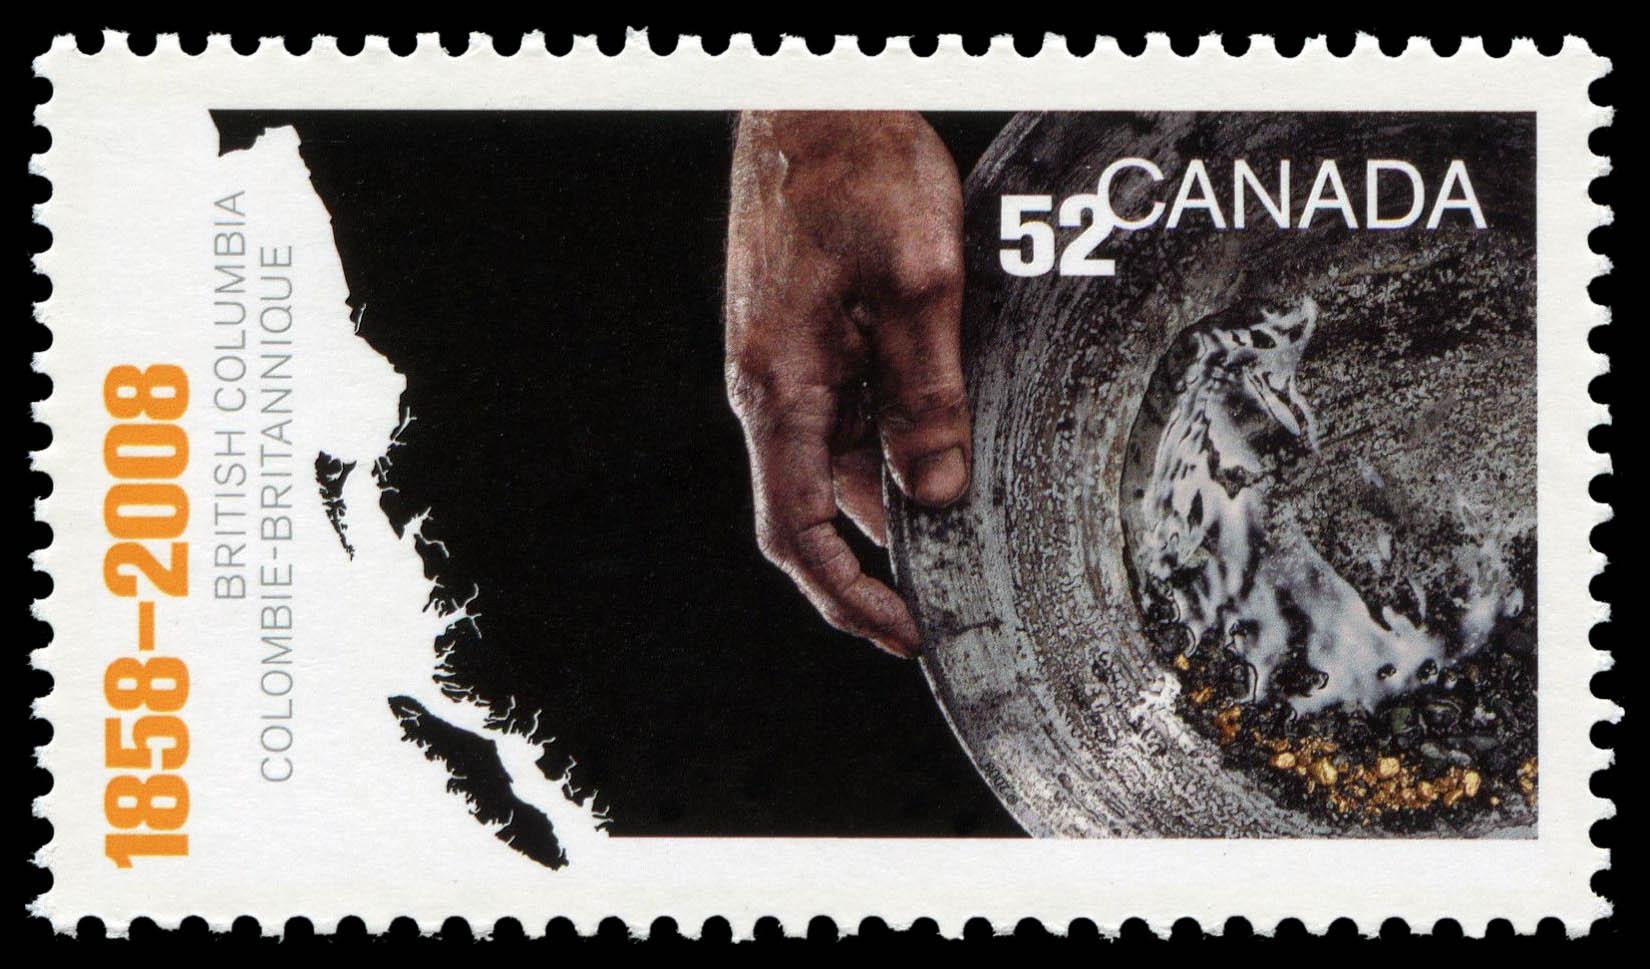 British Columbia's 150th Anniversary Canada Postage Stamp